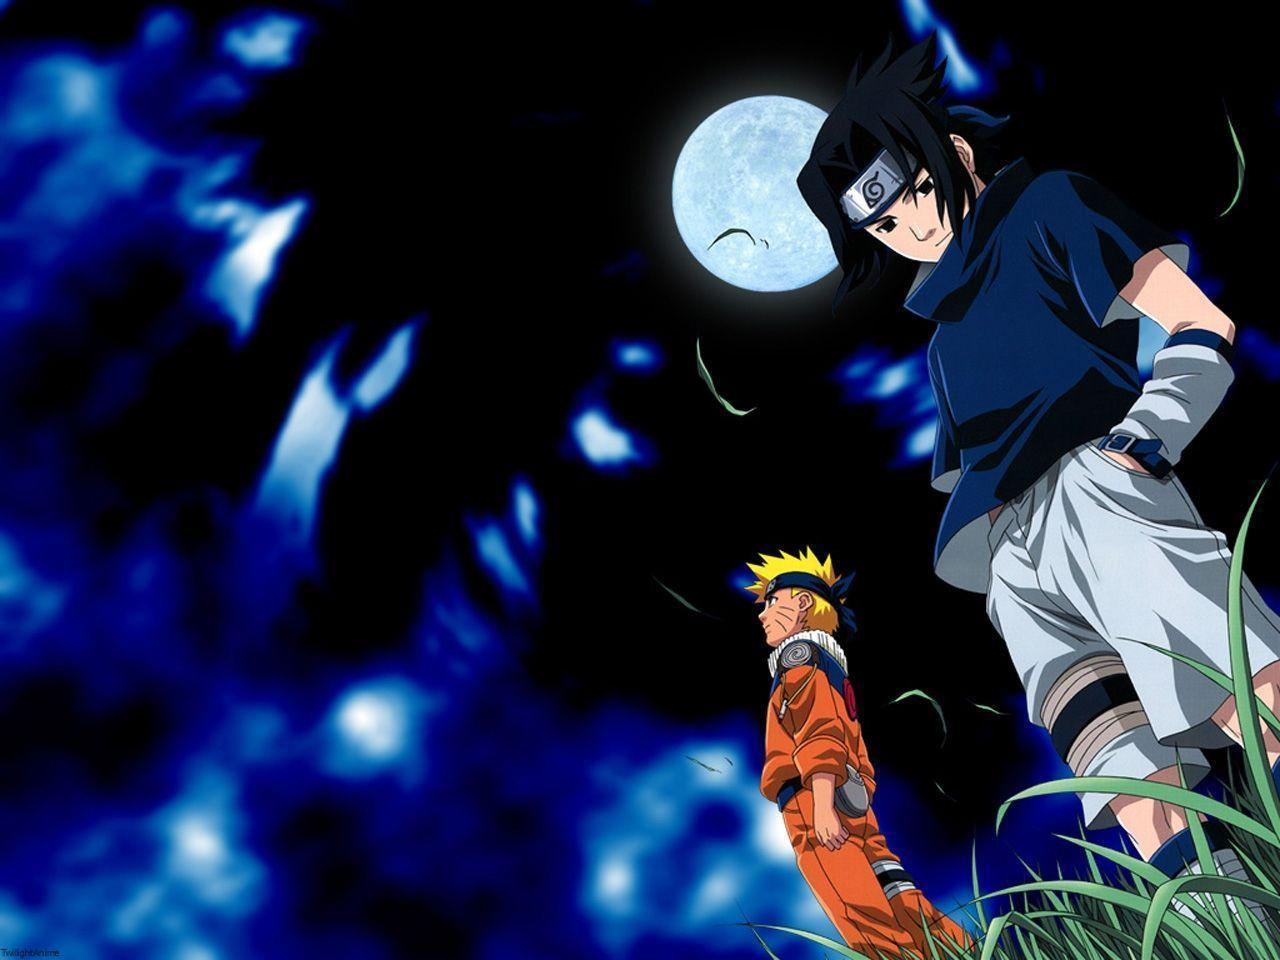 Cartoon Wallpaper Sasuke Vs Itachi Wallpaper: Sasuke And Naruto Wallpapers